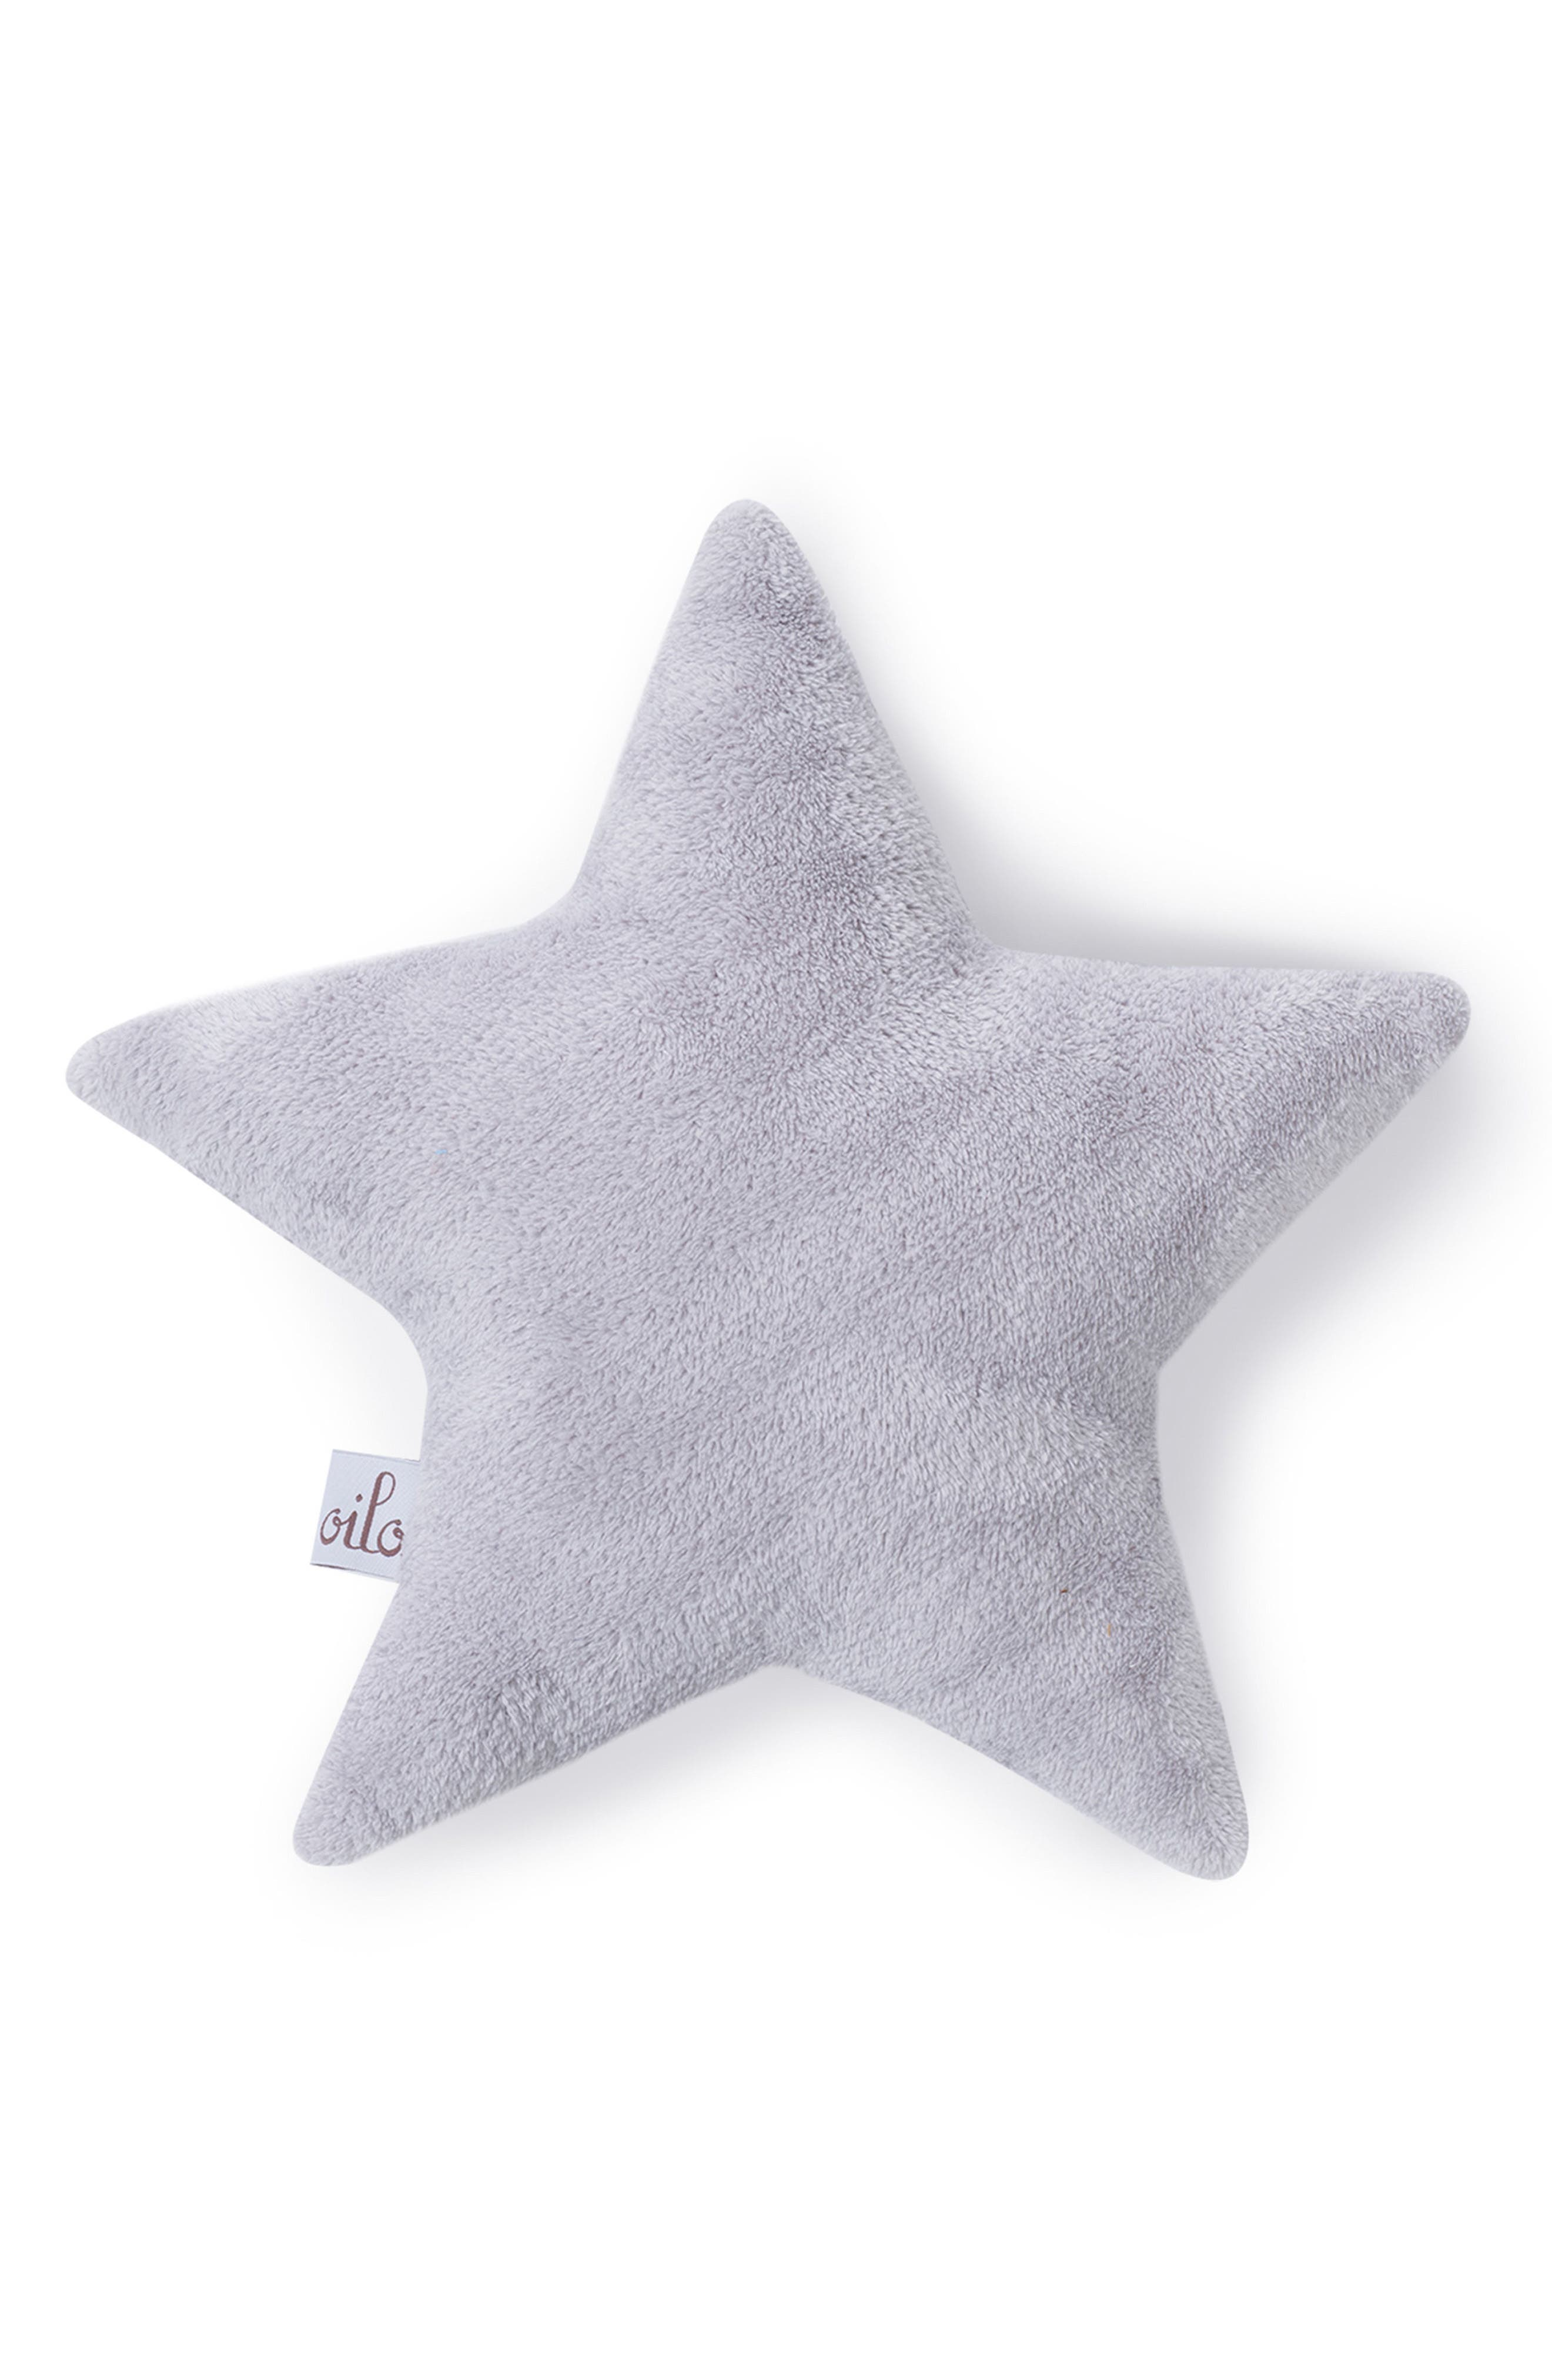 Alternate Image 2  - Oilo Fawn Cuddle Blanket & Star Pillow Set